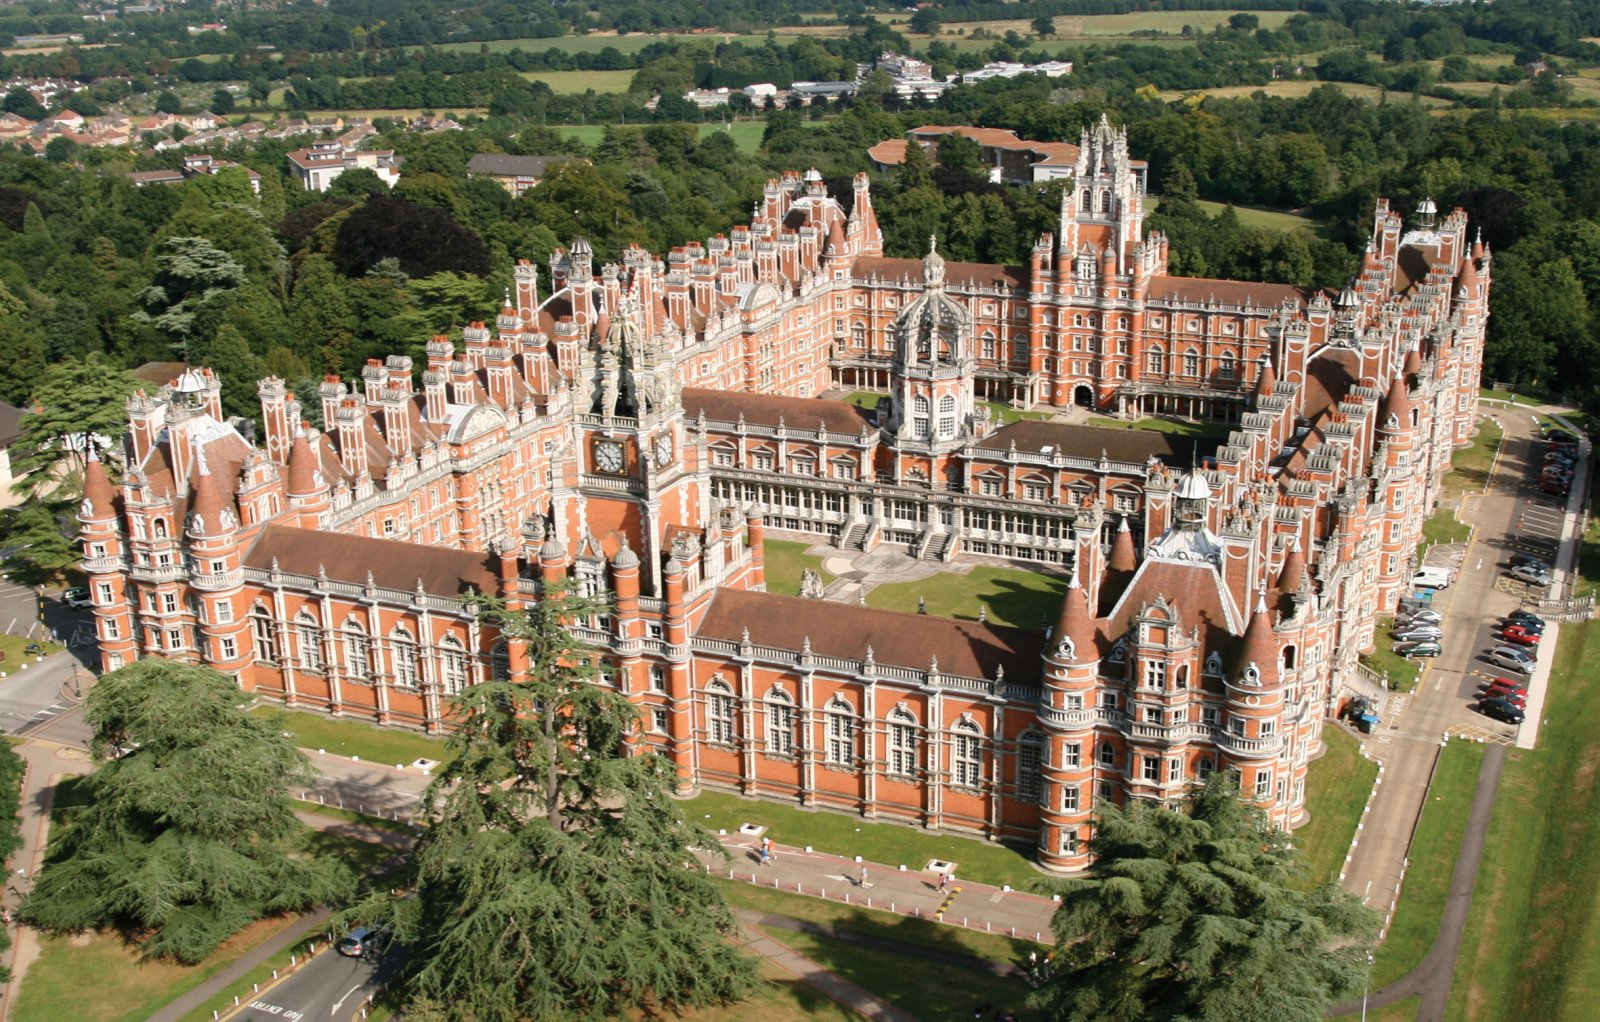 Royal Holloway , University of London (RHUL) มหาวิทยาลัยในอังกฤษ